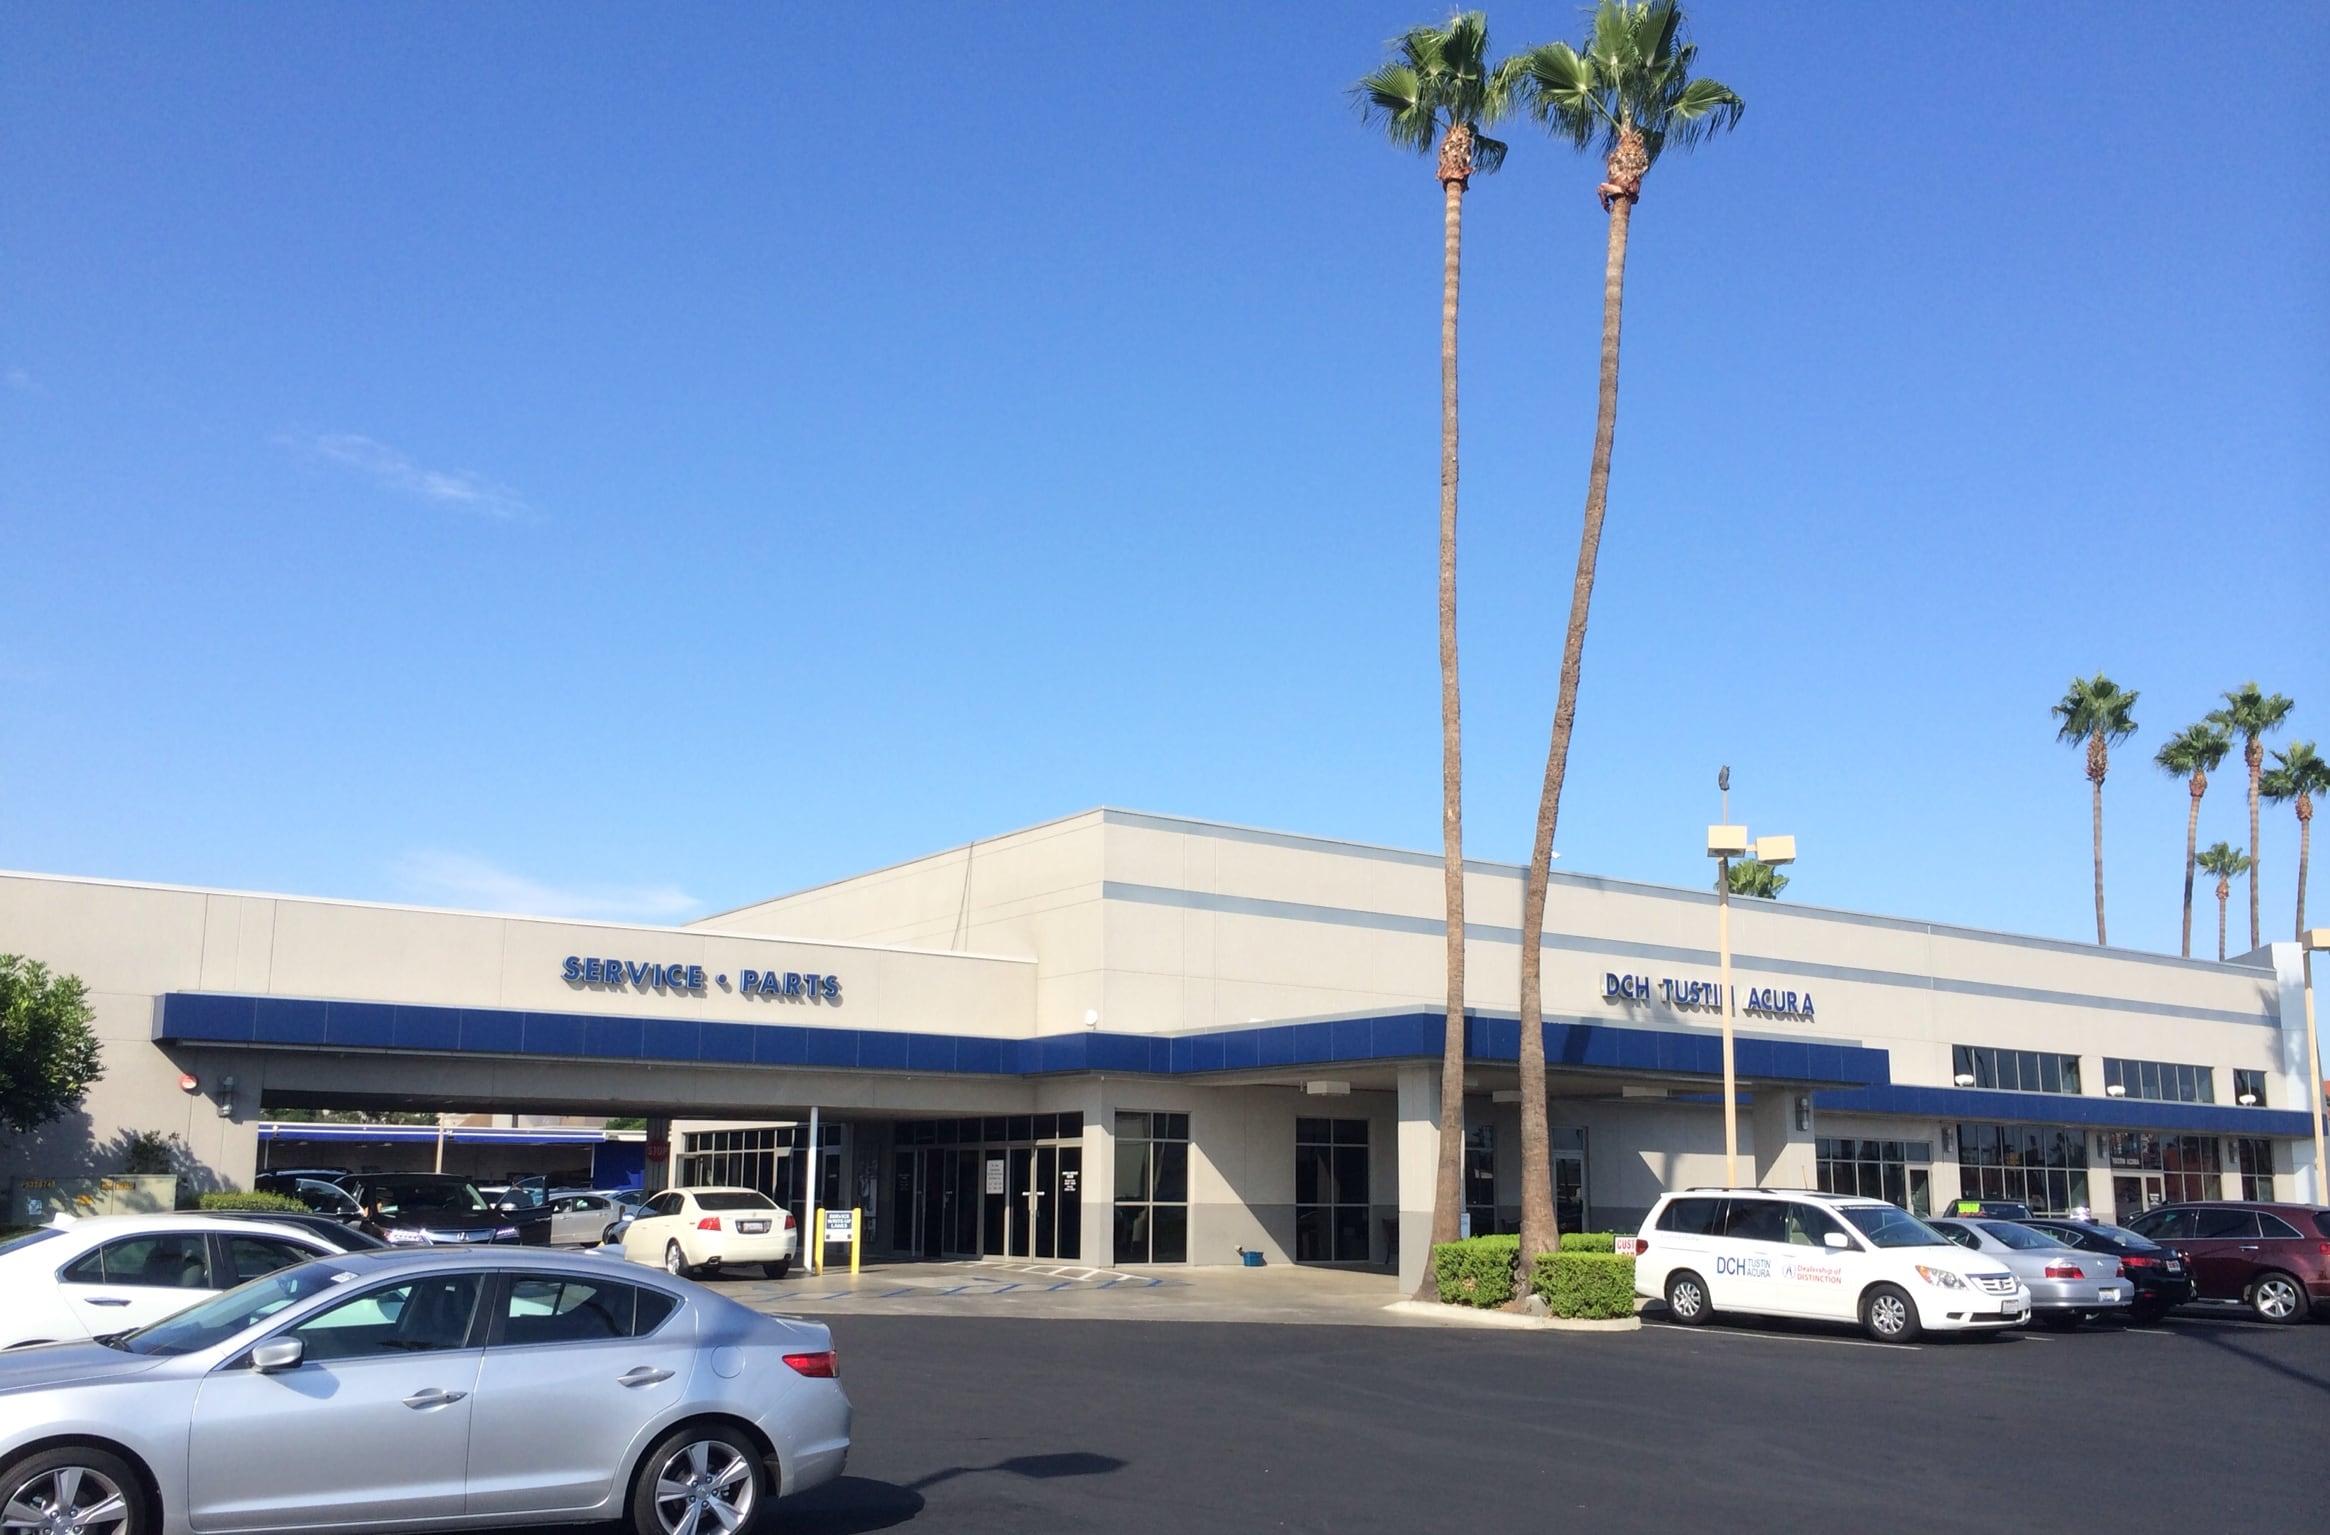 Honda Dealership Orange County >> Acura Car Service & Repair | DCH Tustin Acura | Serving ...